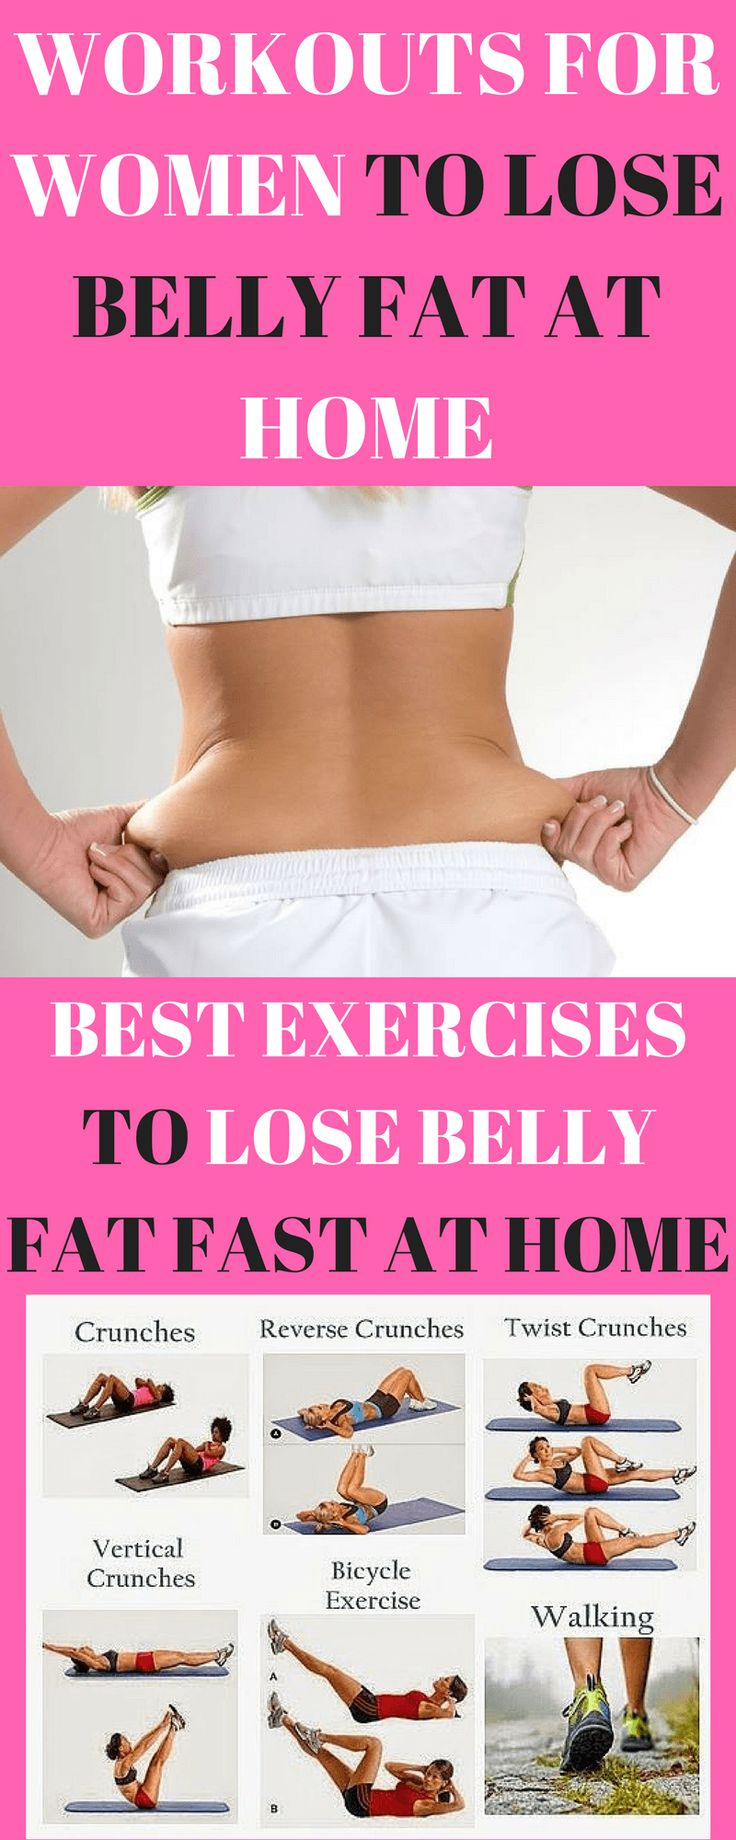 Pin on Health Board Food & Fitness